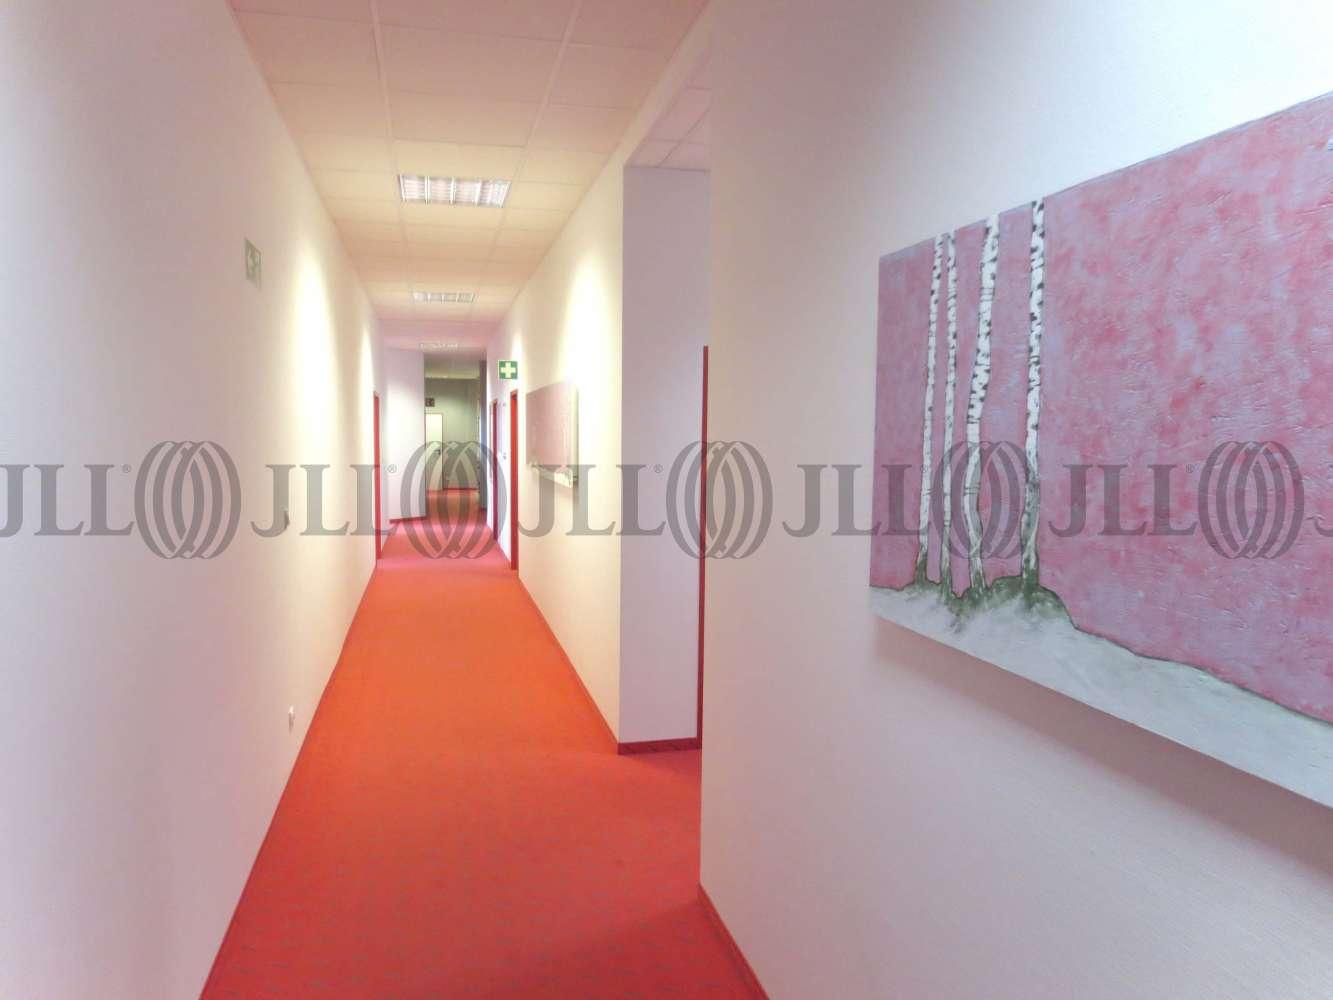 Büros Nürnberg, 90411 - Büro - Nürnberg, Marienberg - M1242 - 9411413